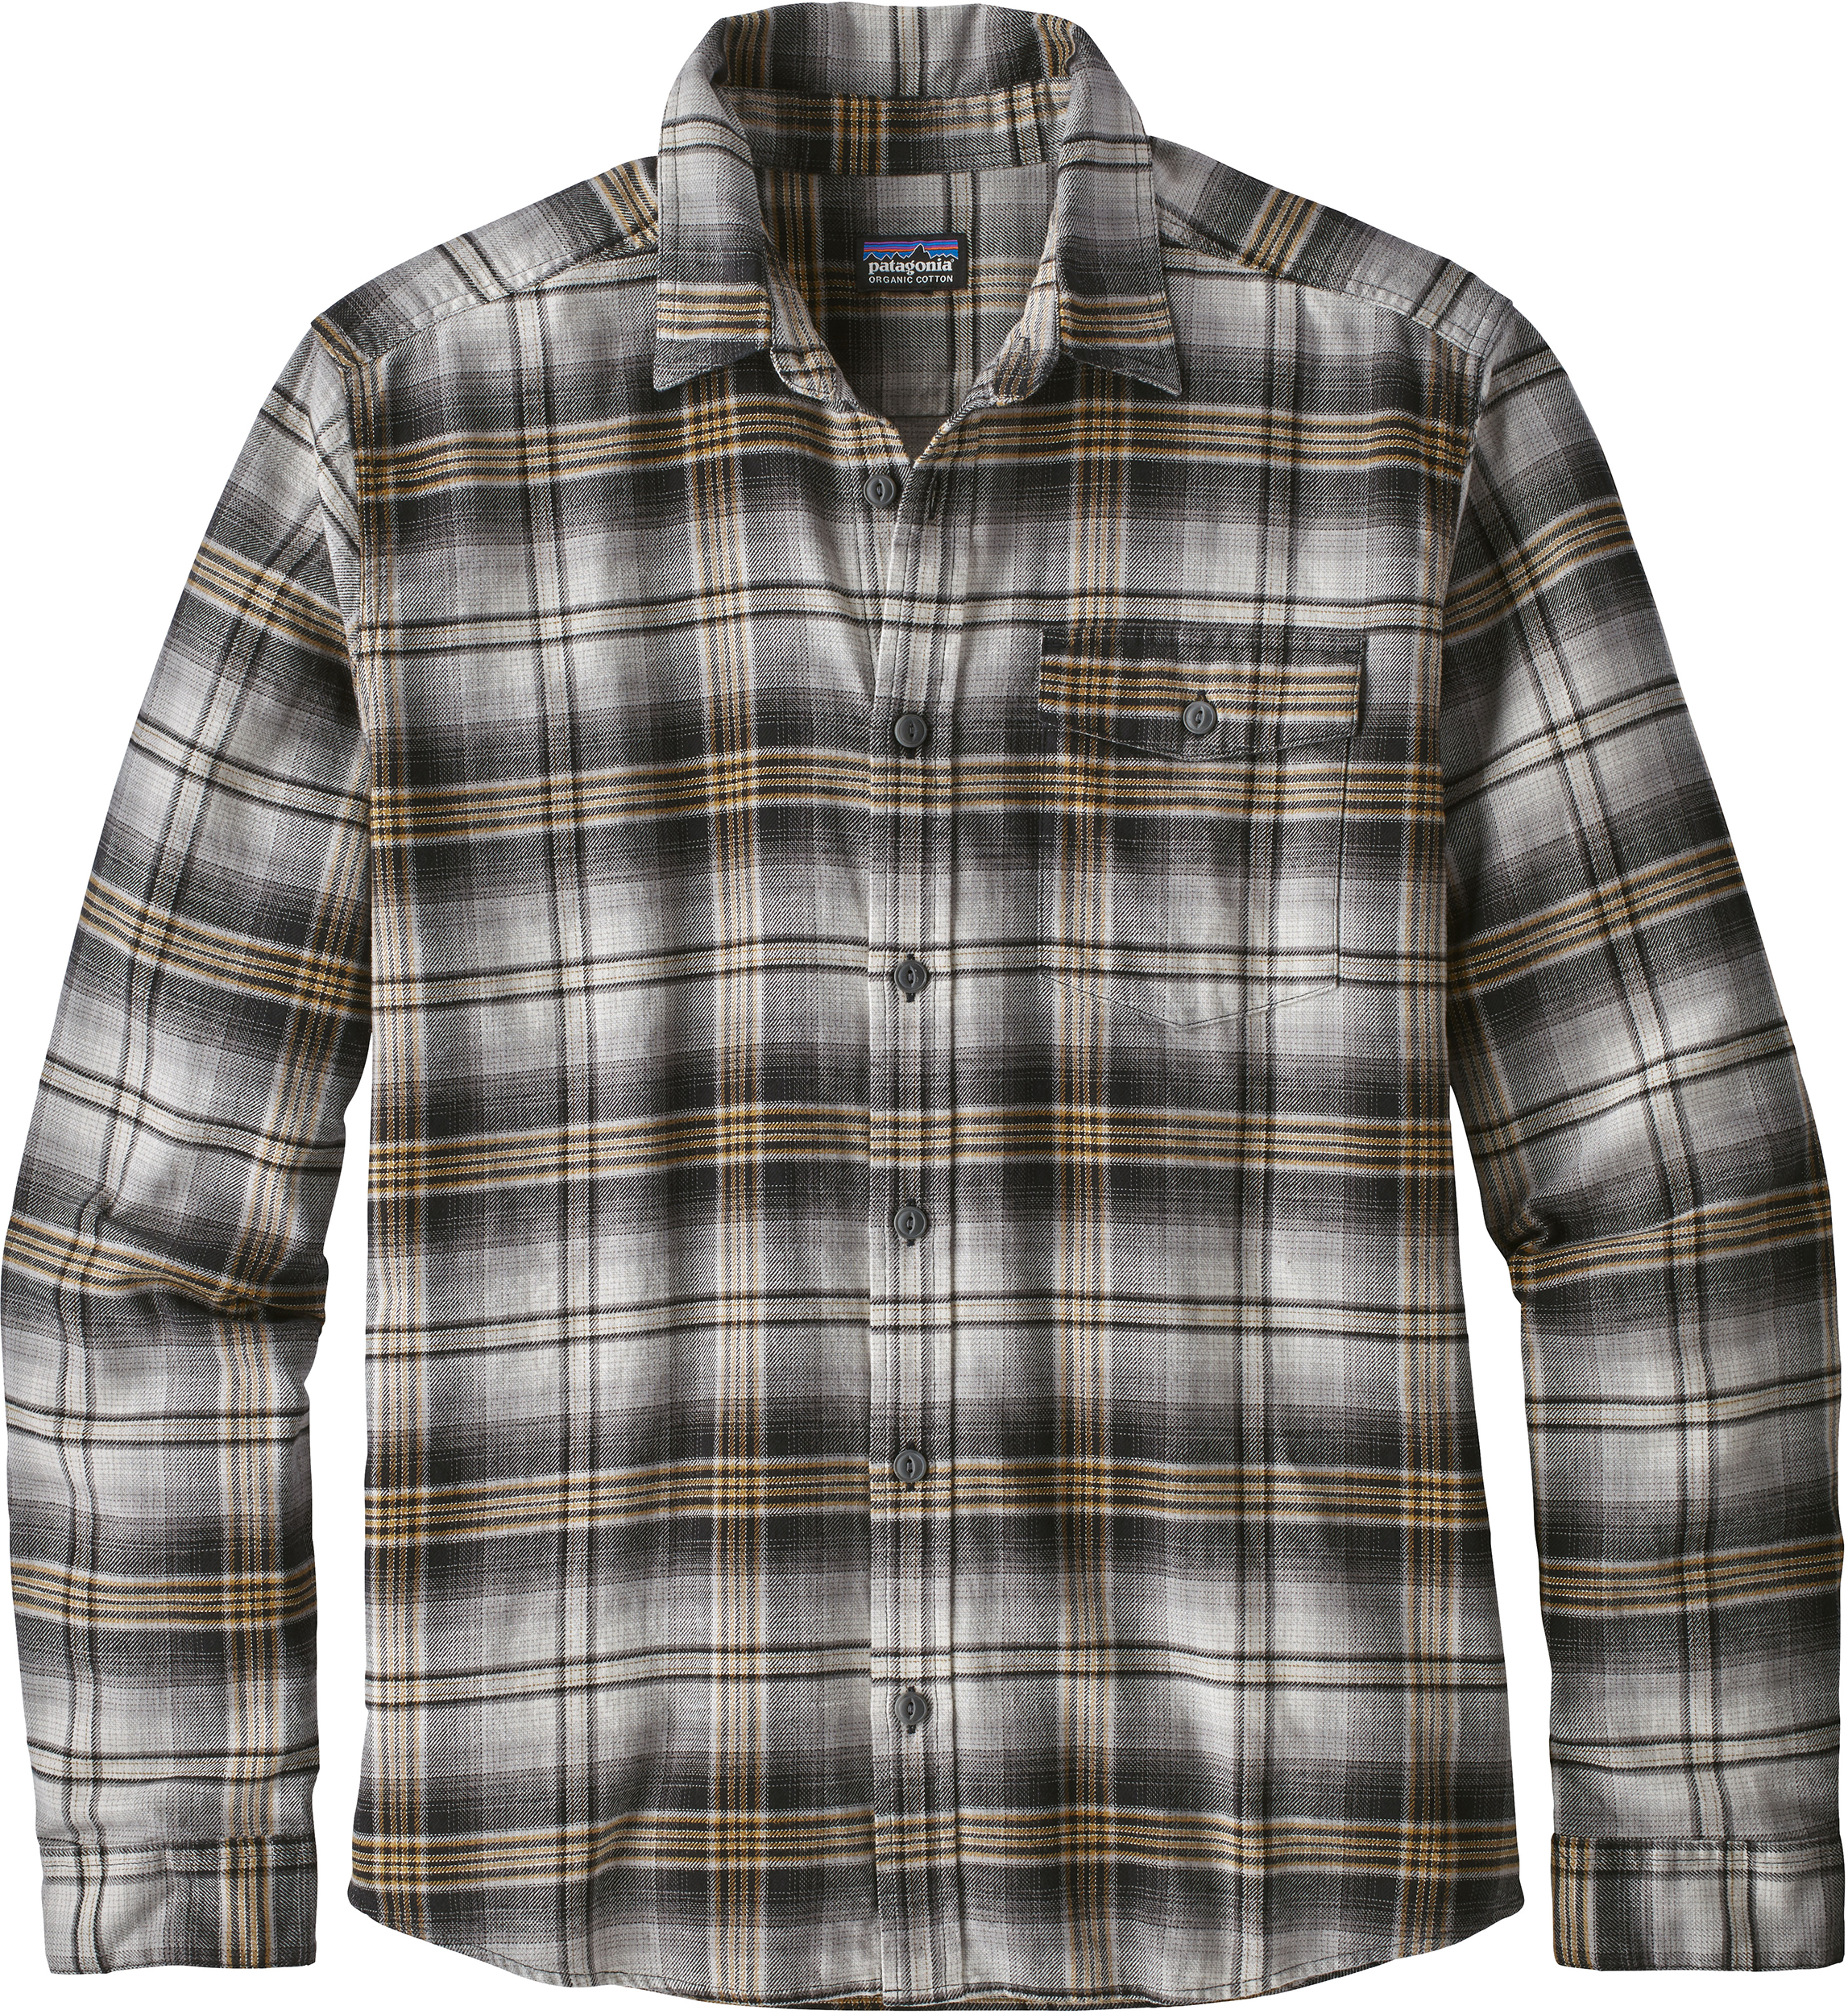 04c6f1cf2 Men s Clothing